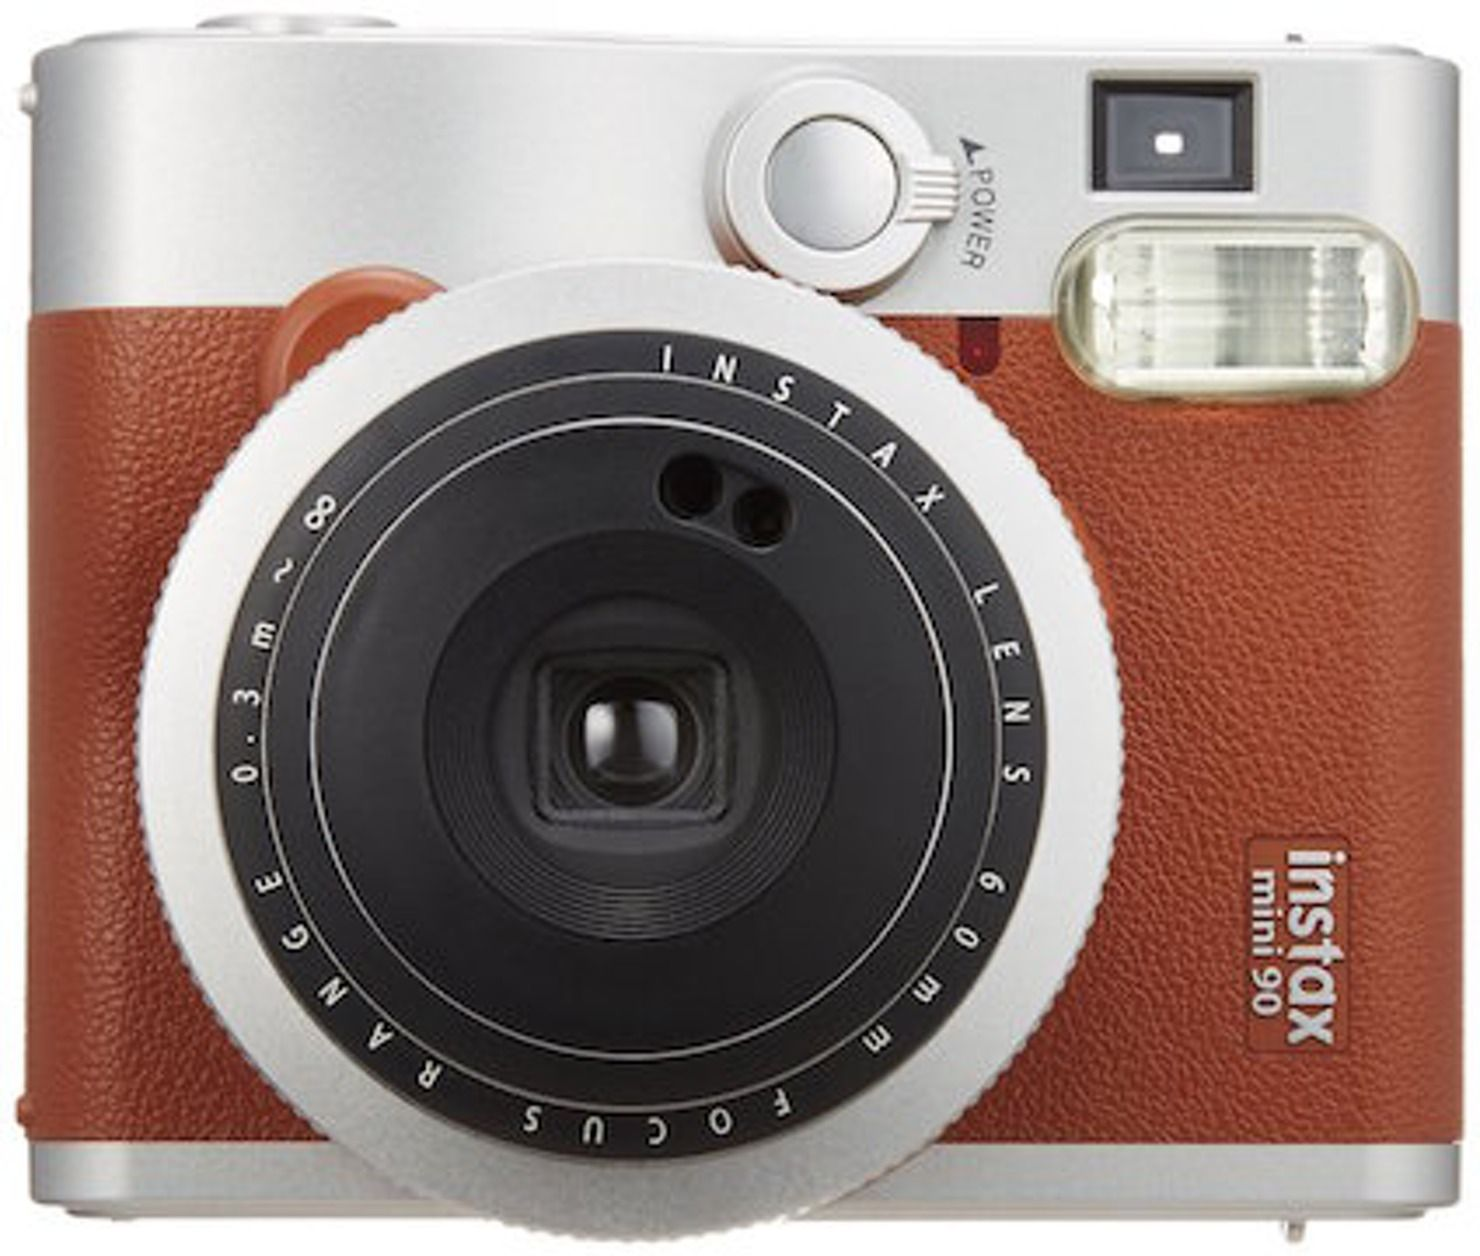 15 Thoughtful Gifts For The Guy Who Has Everything Fujifilm Instax Mini Fujifilm Instax Camara Fujifilm